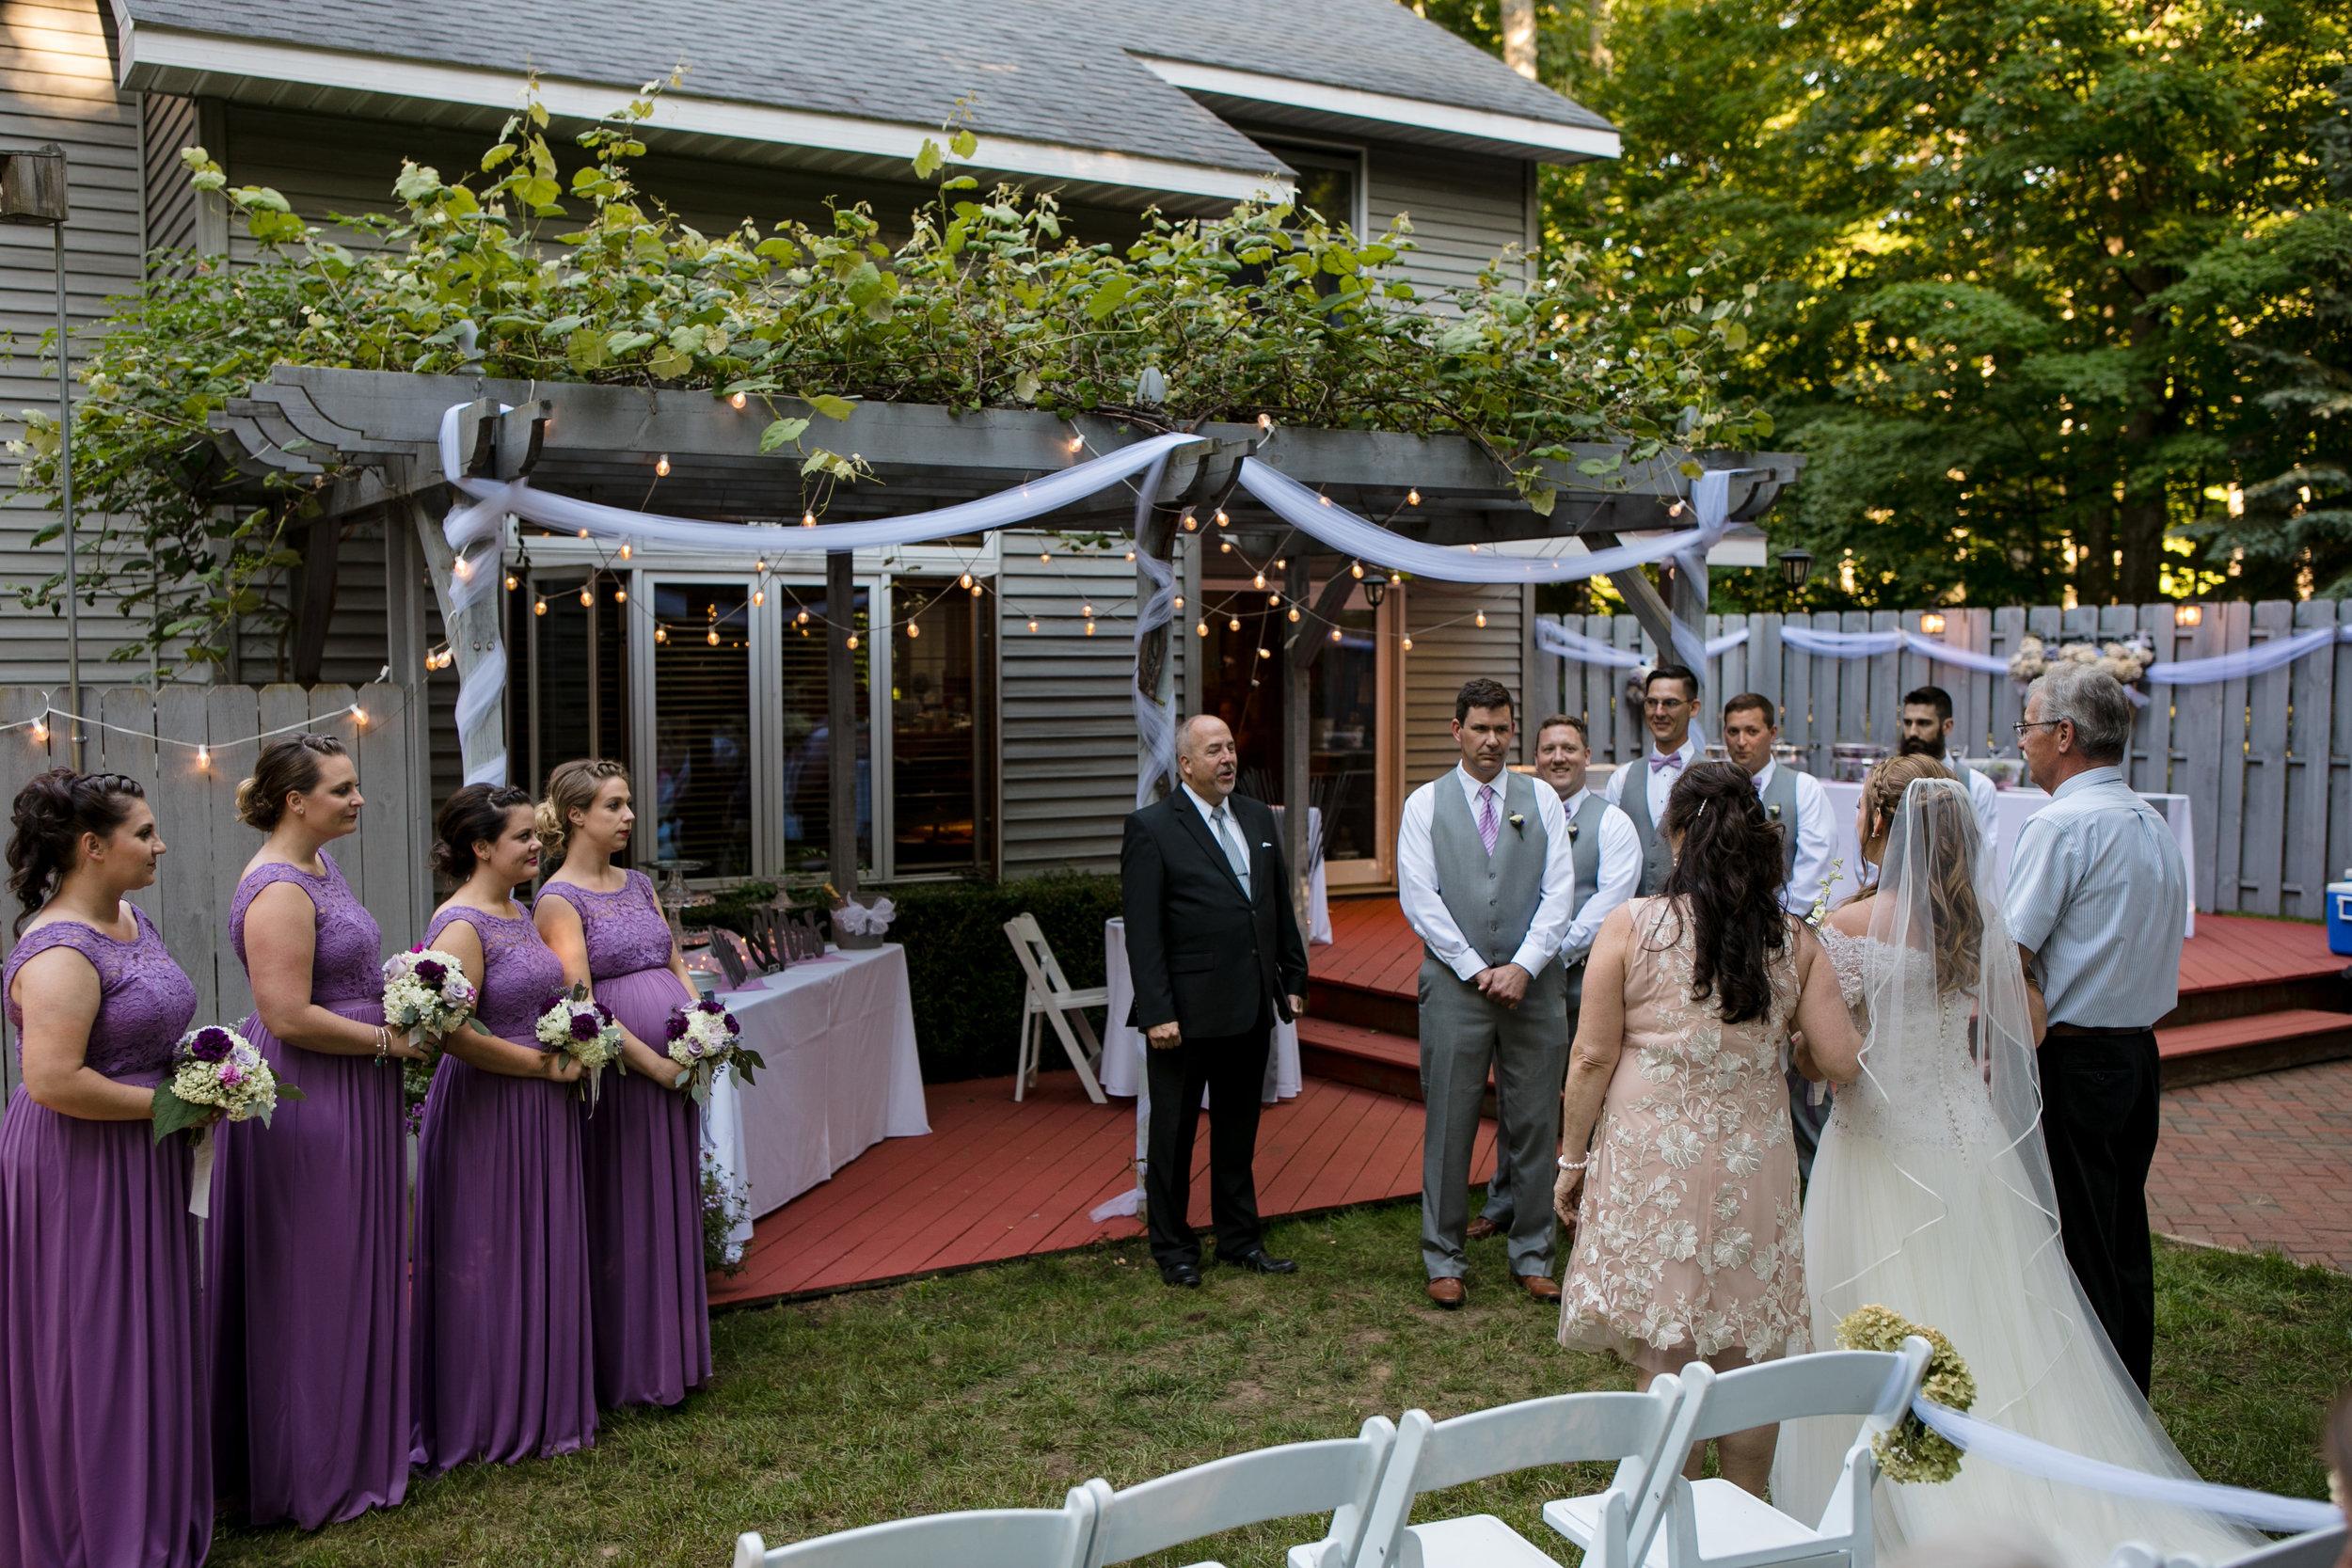 ludington-michigan-intimate-backyard-wedding-jessica-nolan252.jpg